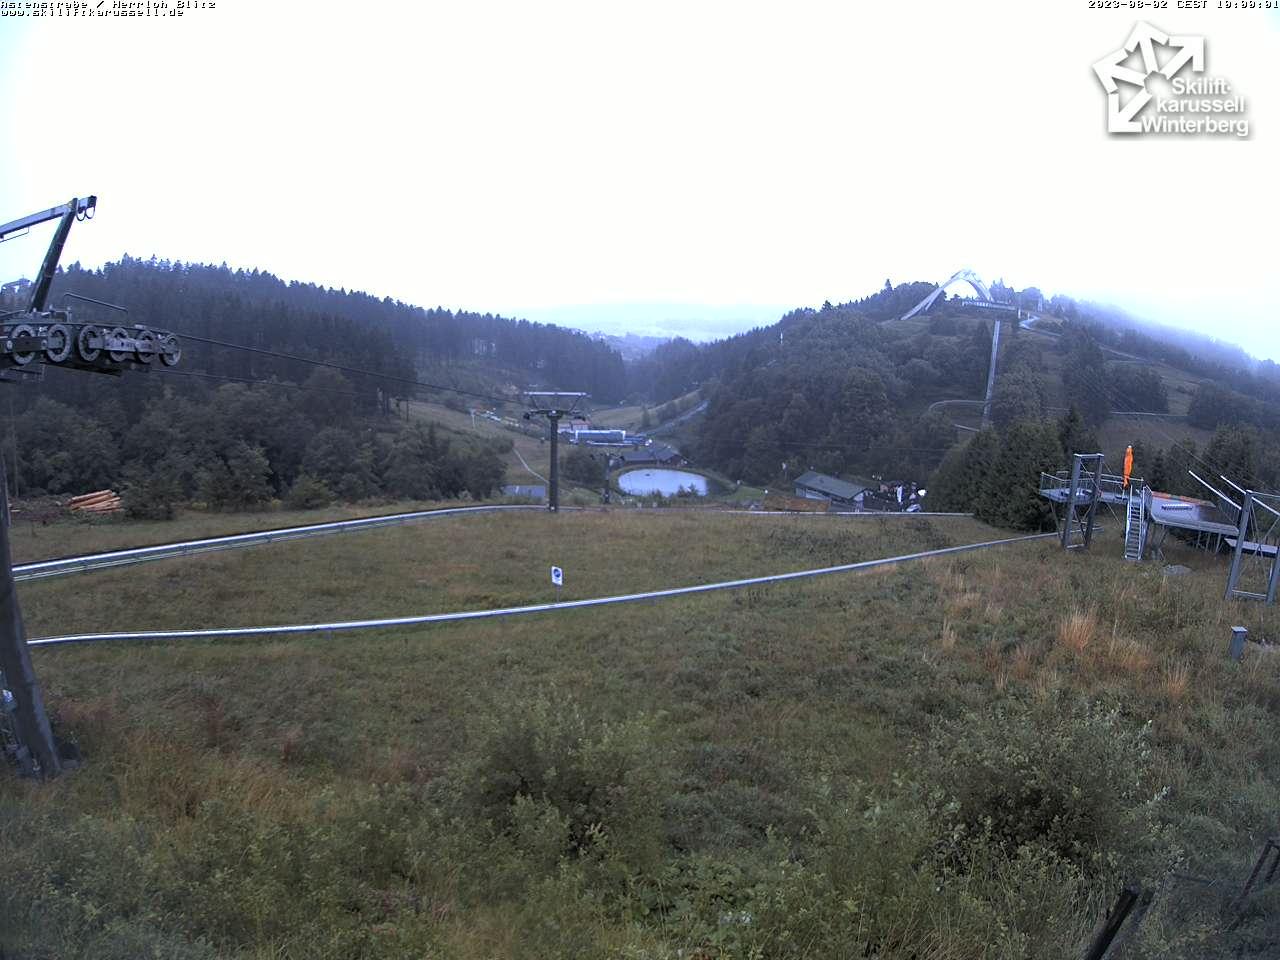 Webcam Skigebied Winterberg Astentrasse - Sauerland